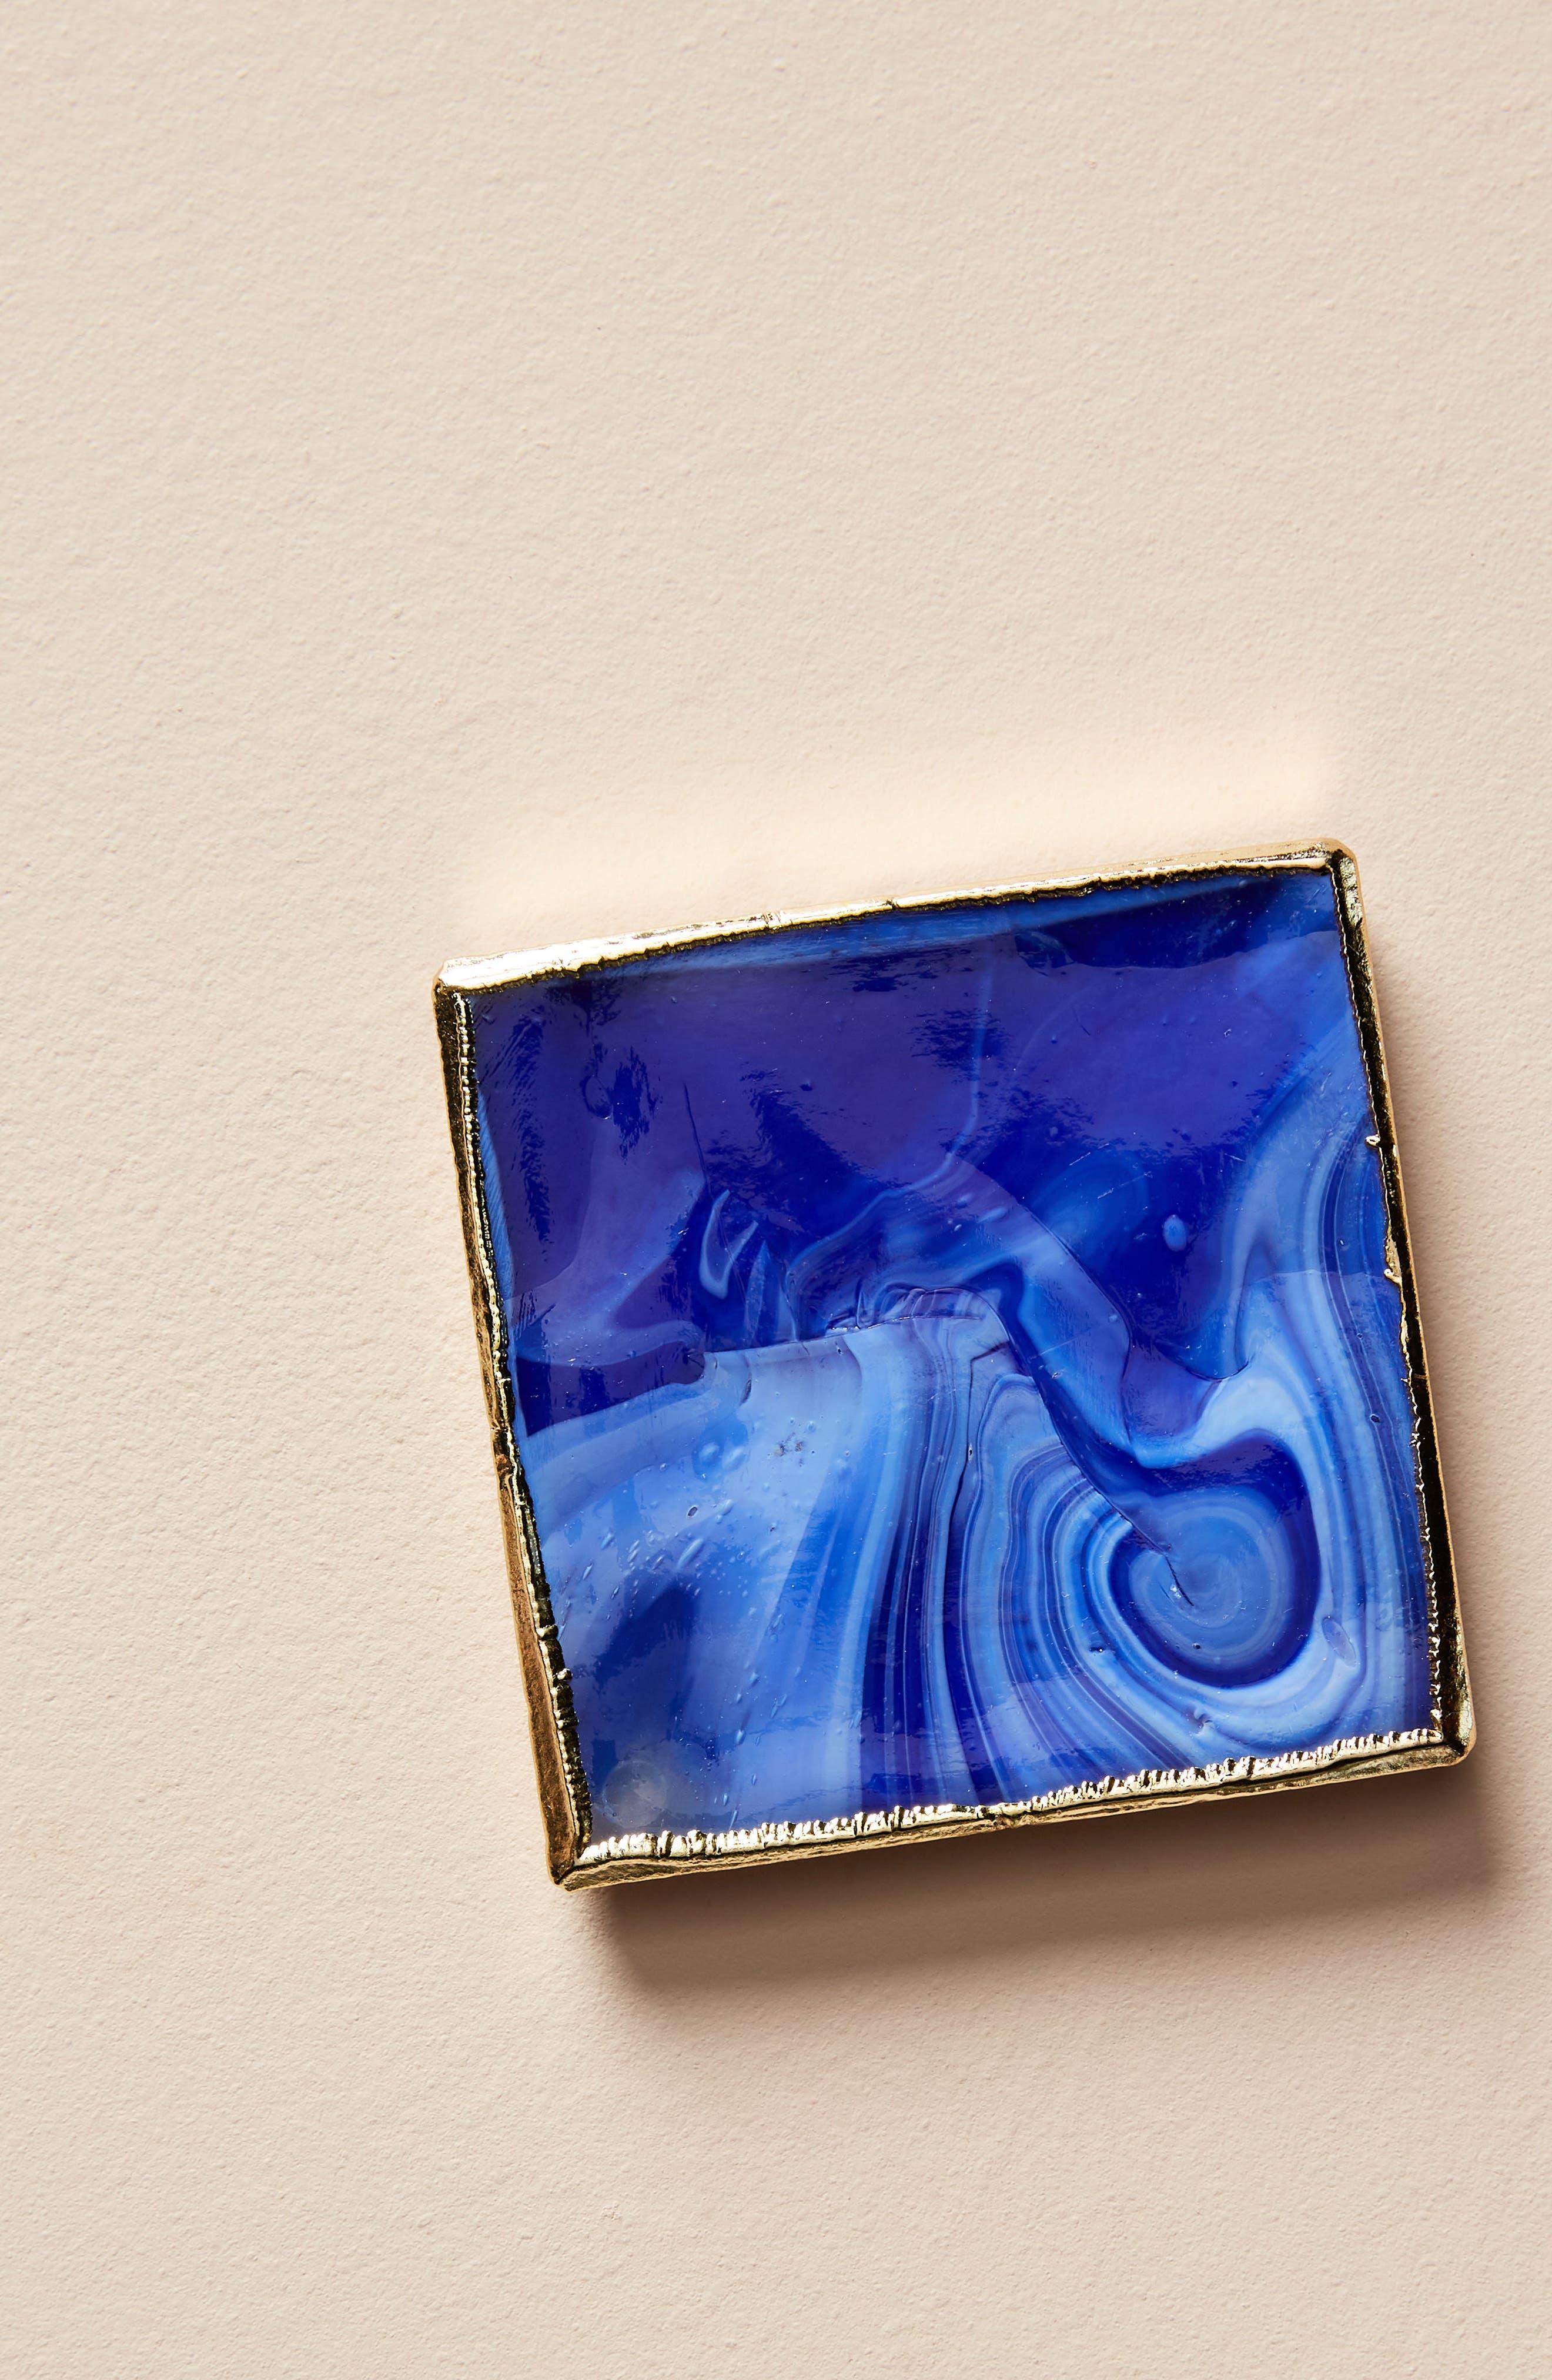 Swirled Coaster,                             Main thumbnail 1, color,                             Blue